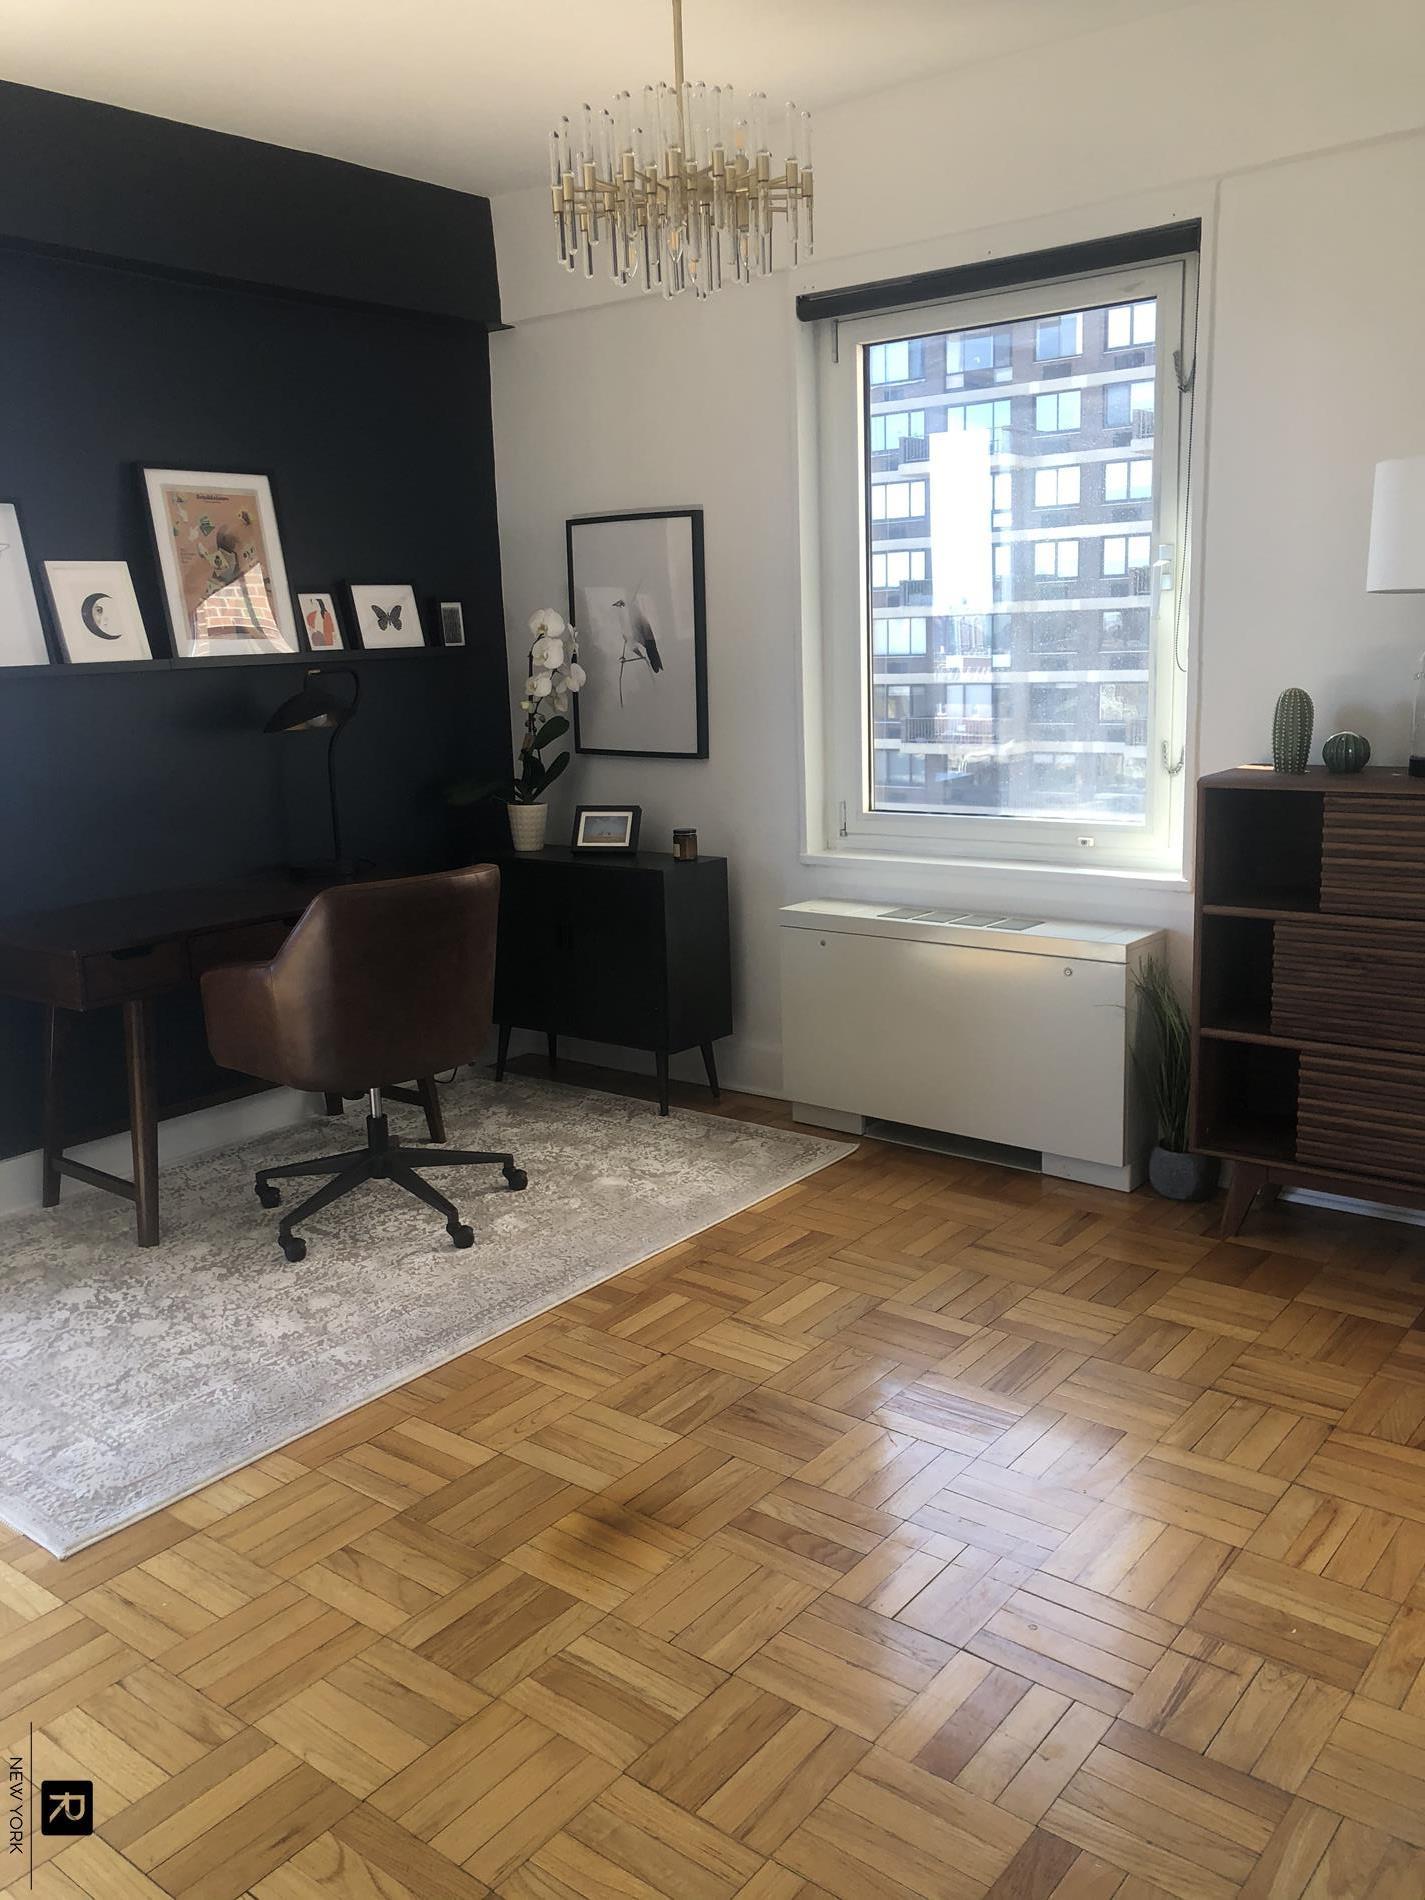 45 East 89th Street 24-G Carnegie Hill New York NY 10128